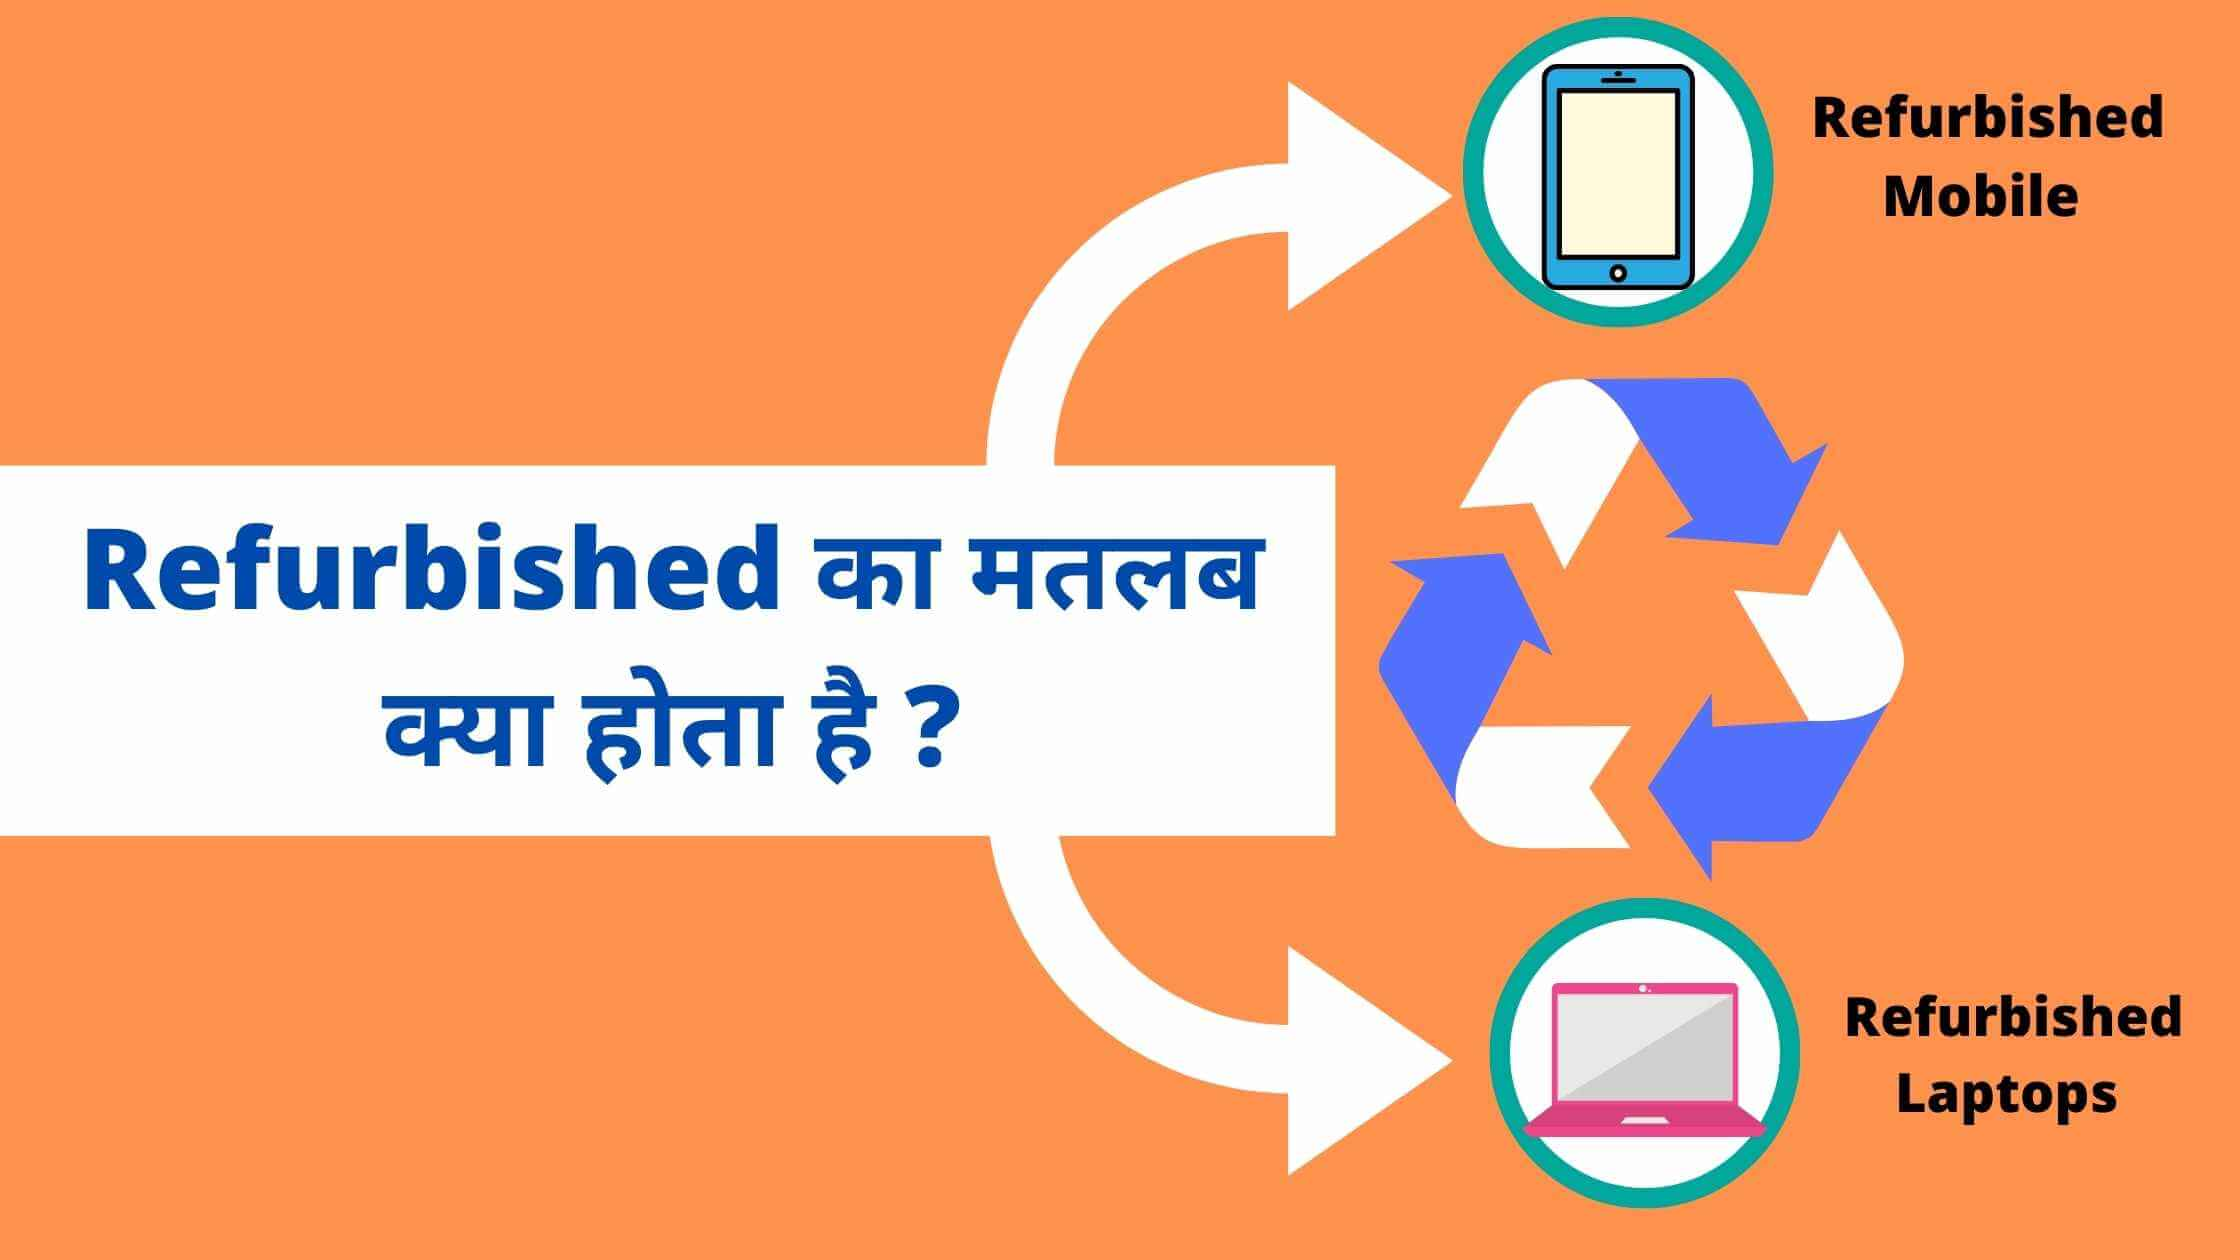 Refurbished Meaning in Hindi जानिए Refurbished का मतलब क्या होता है